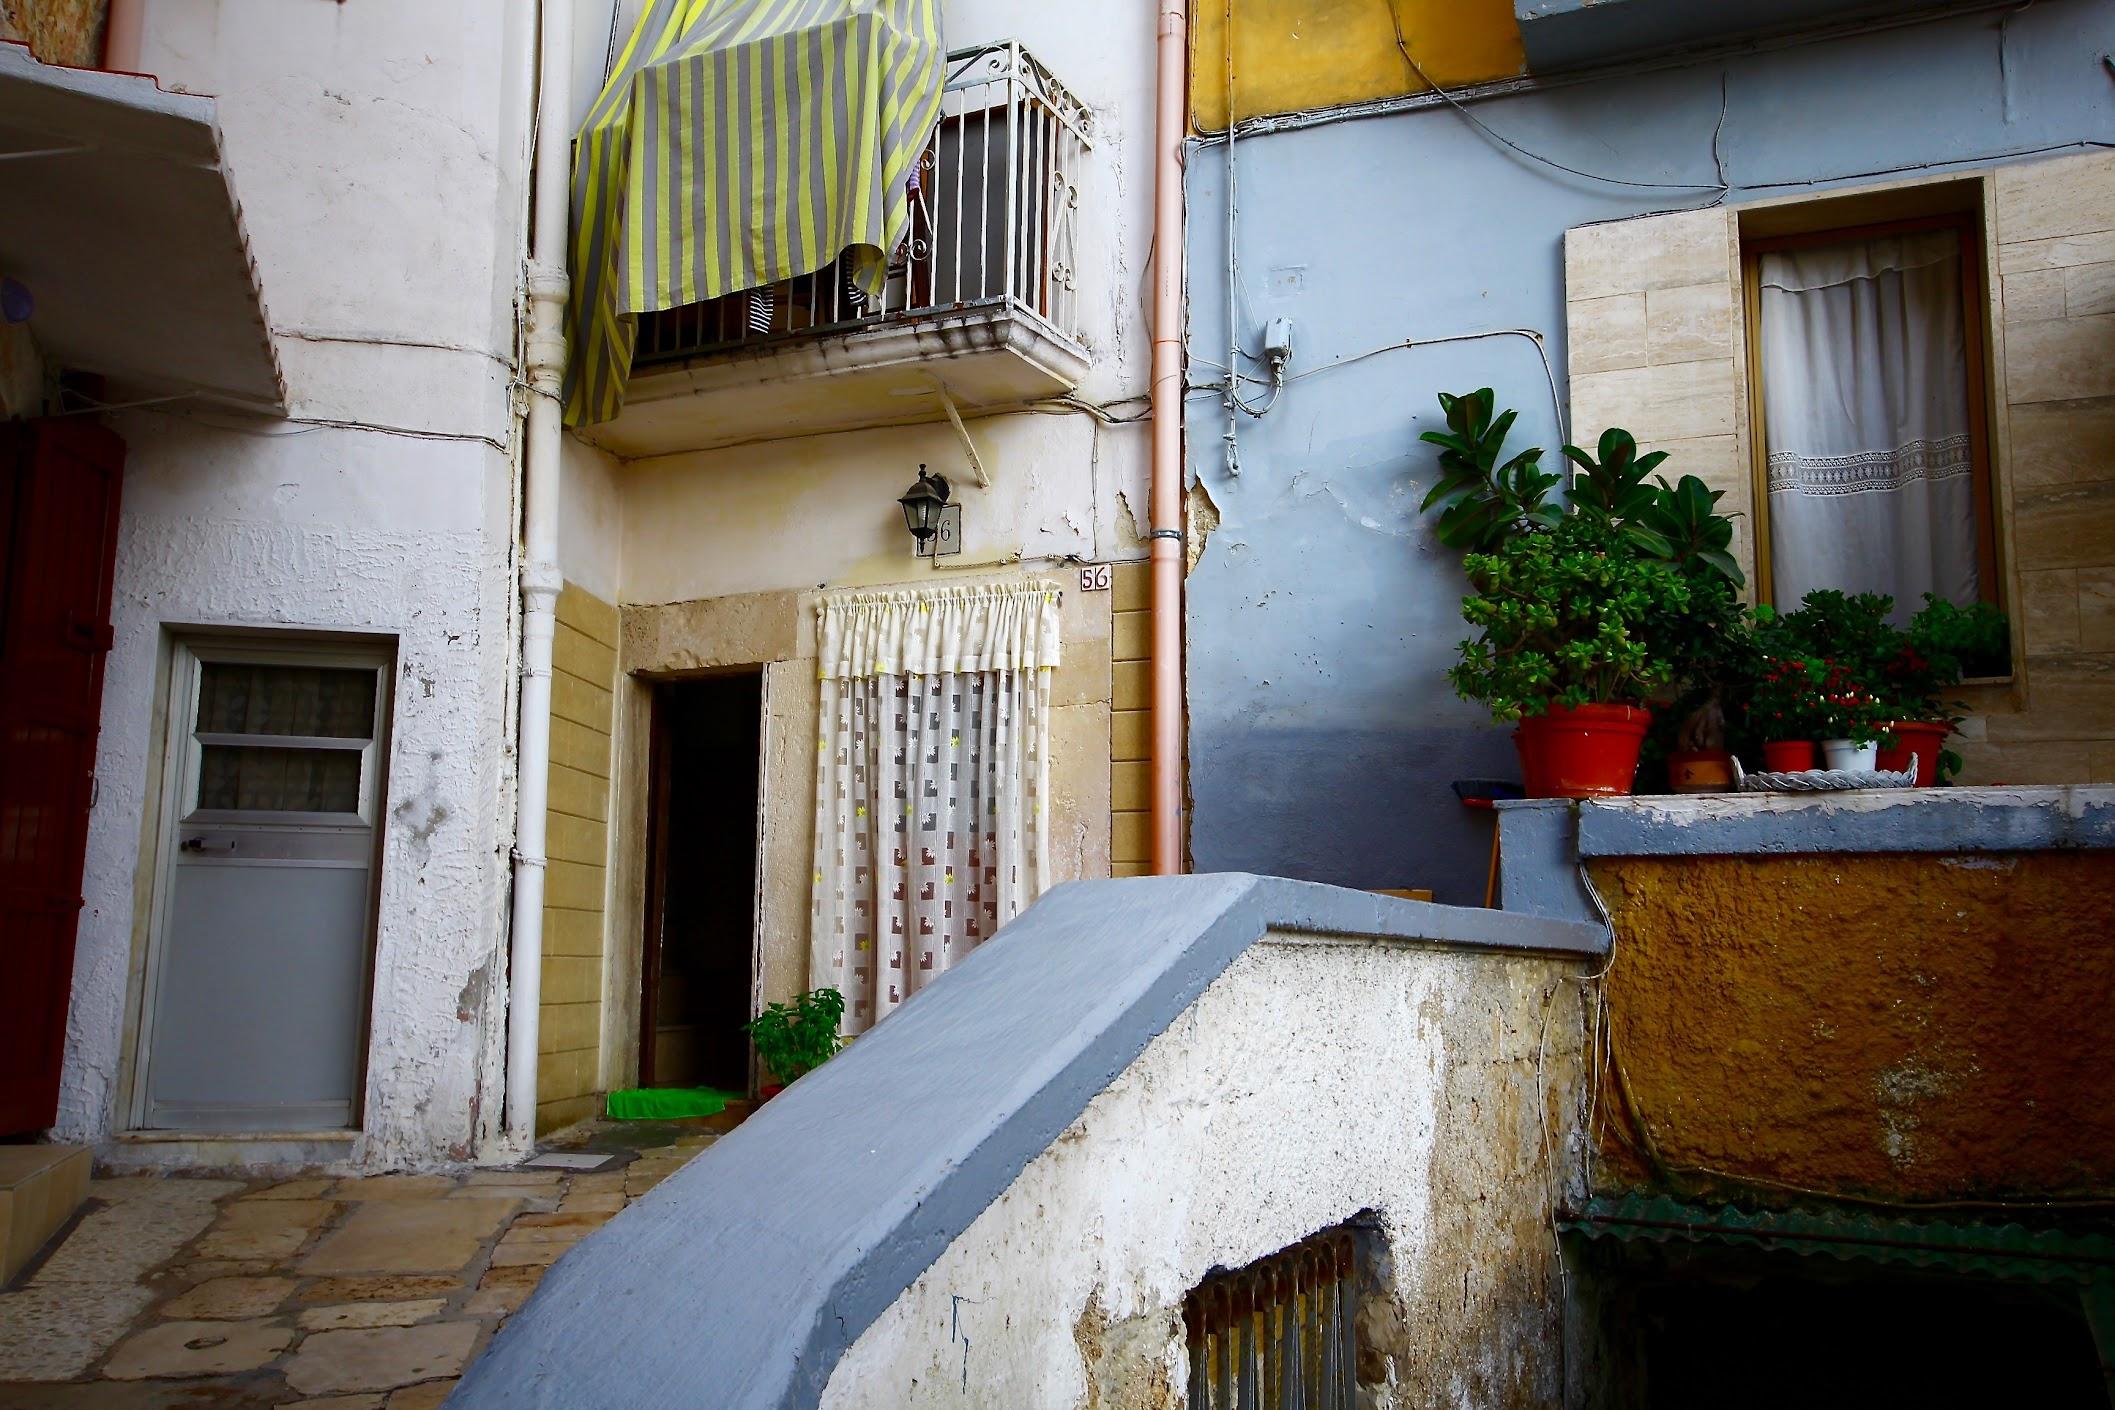 Bari, Apulia, Puglia, Italy